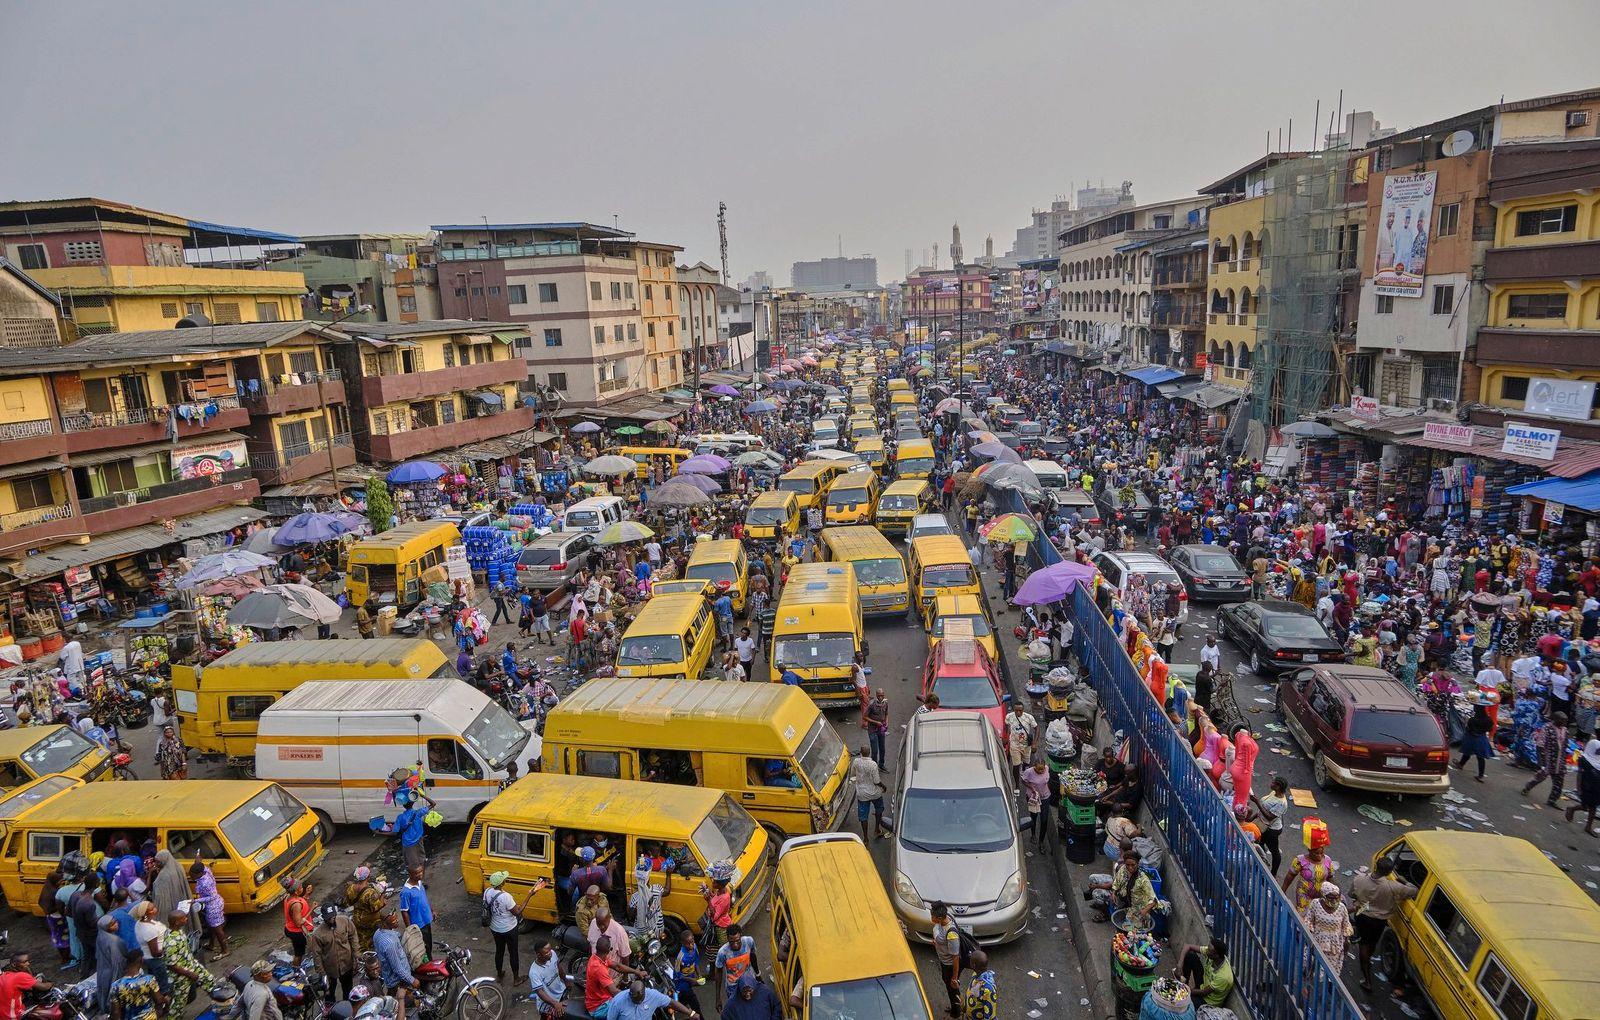 Daily life in Nigeria amid Covid-19